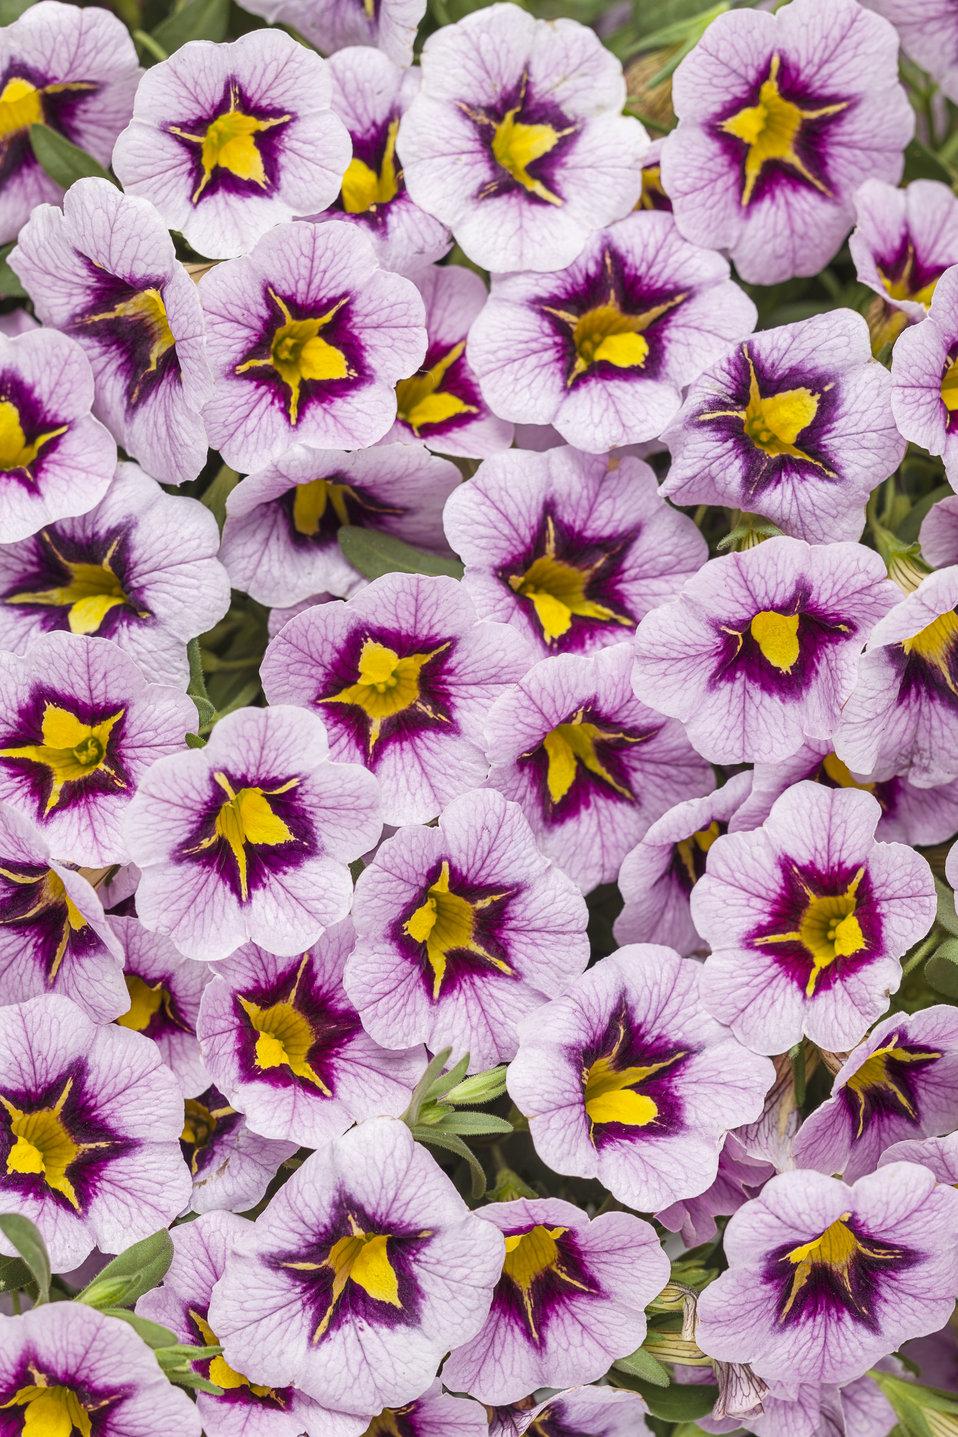 Superbells Morning Star - Calibrachoa hybrid   Proven